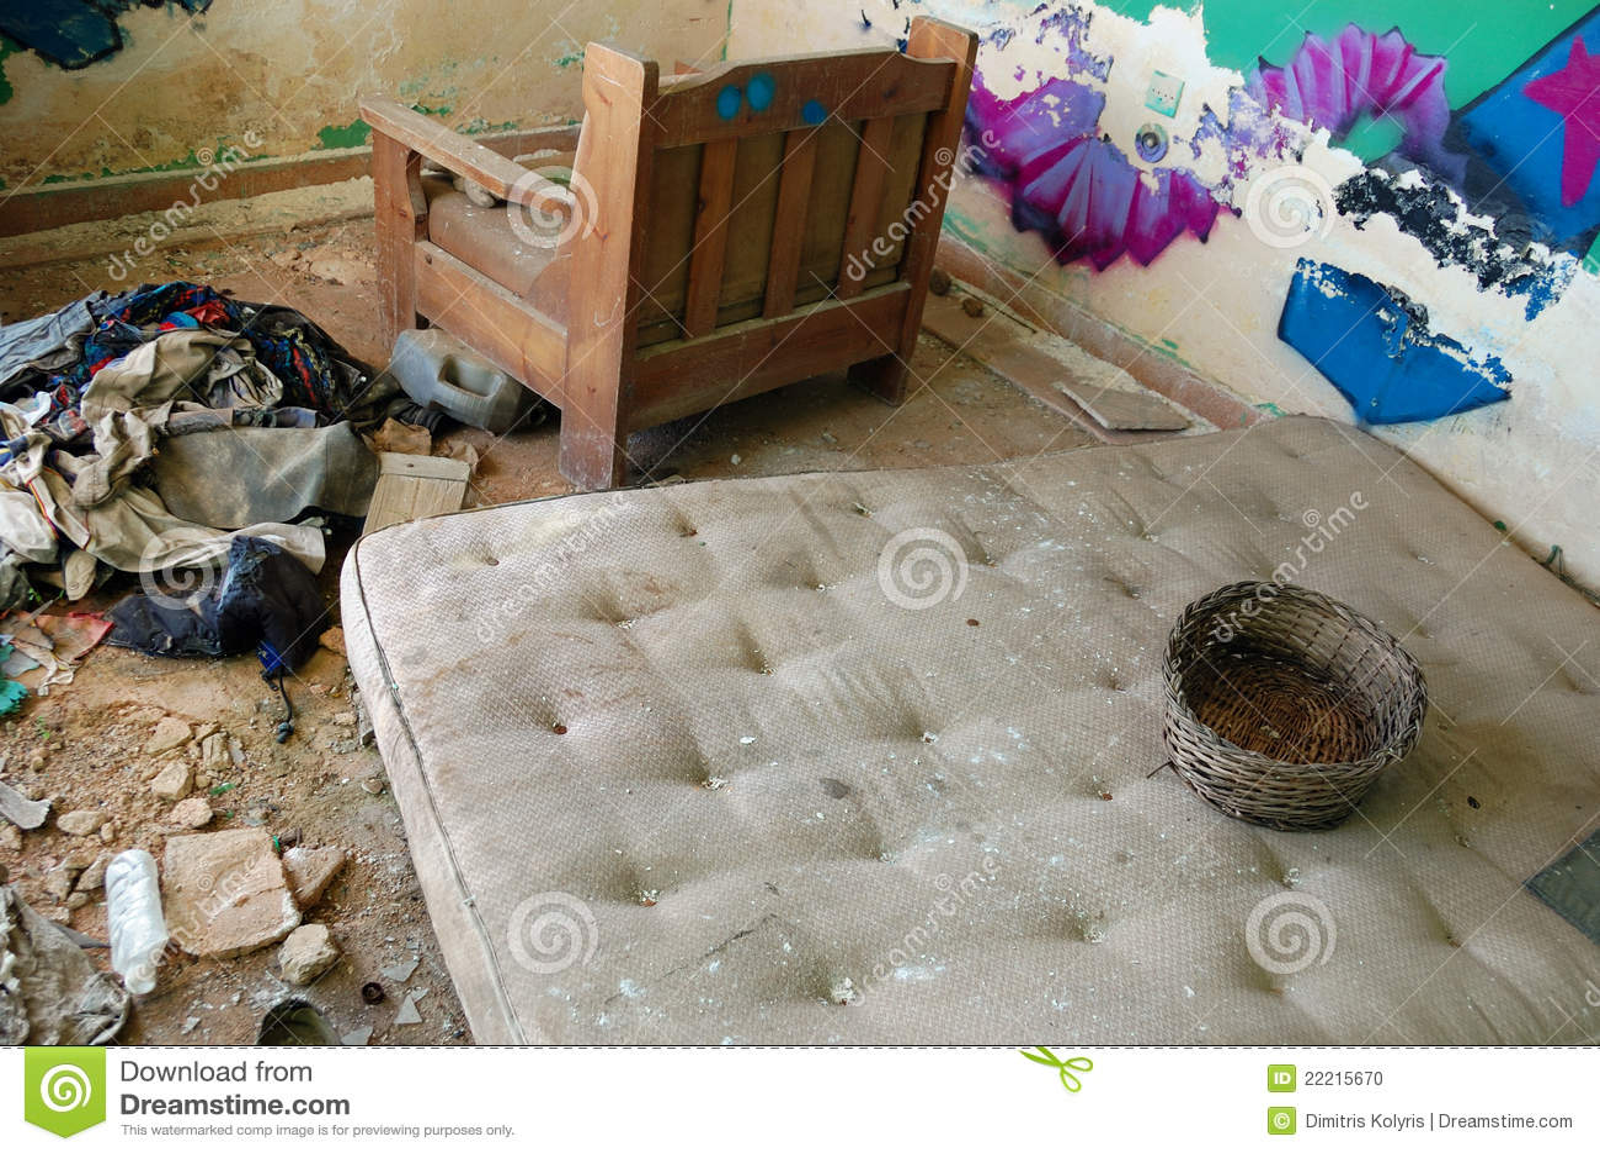 Schmutzige Matratze in verlassenem Haus